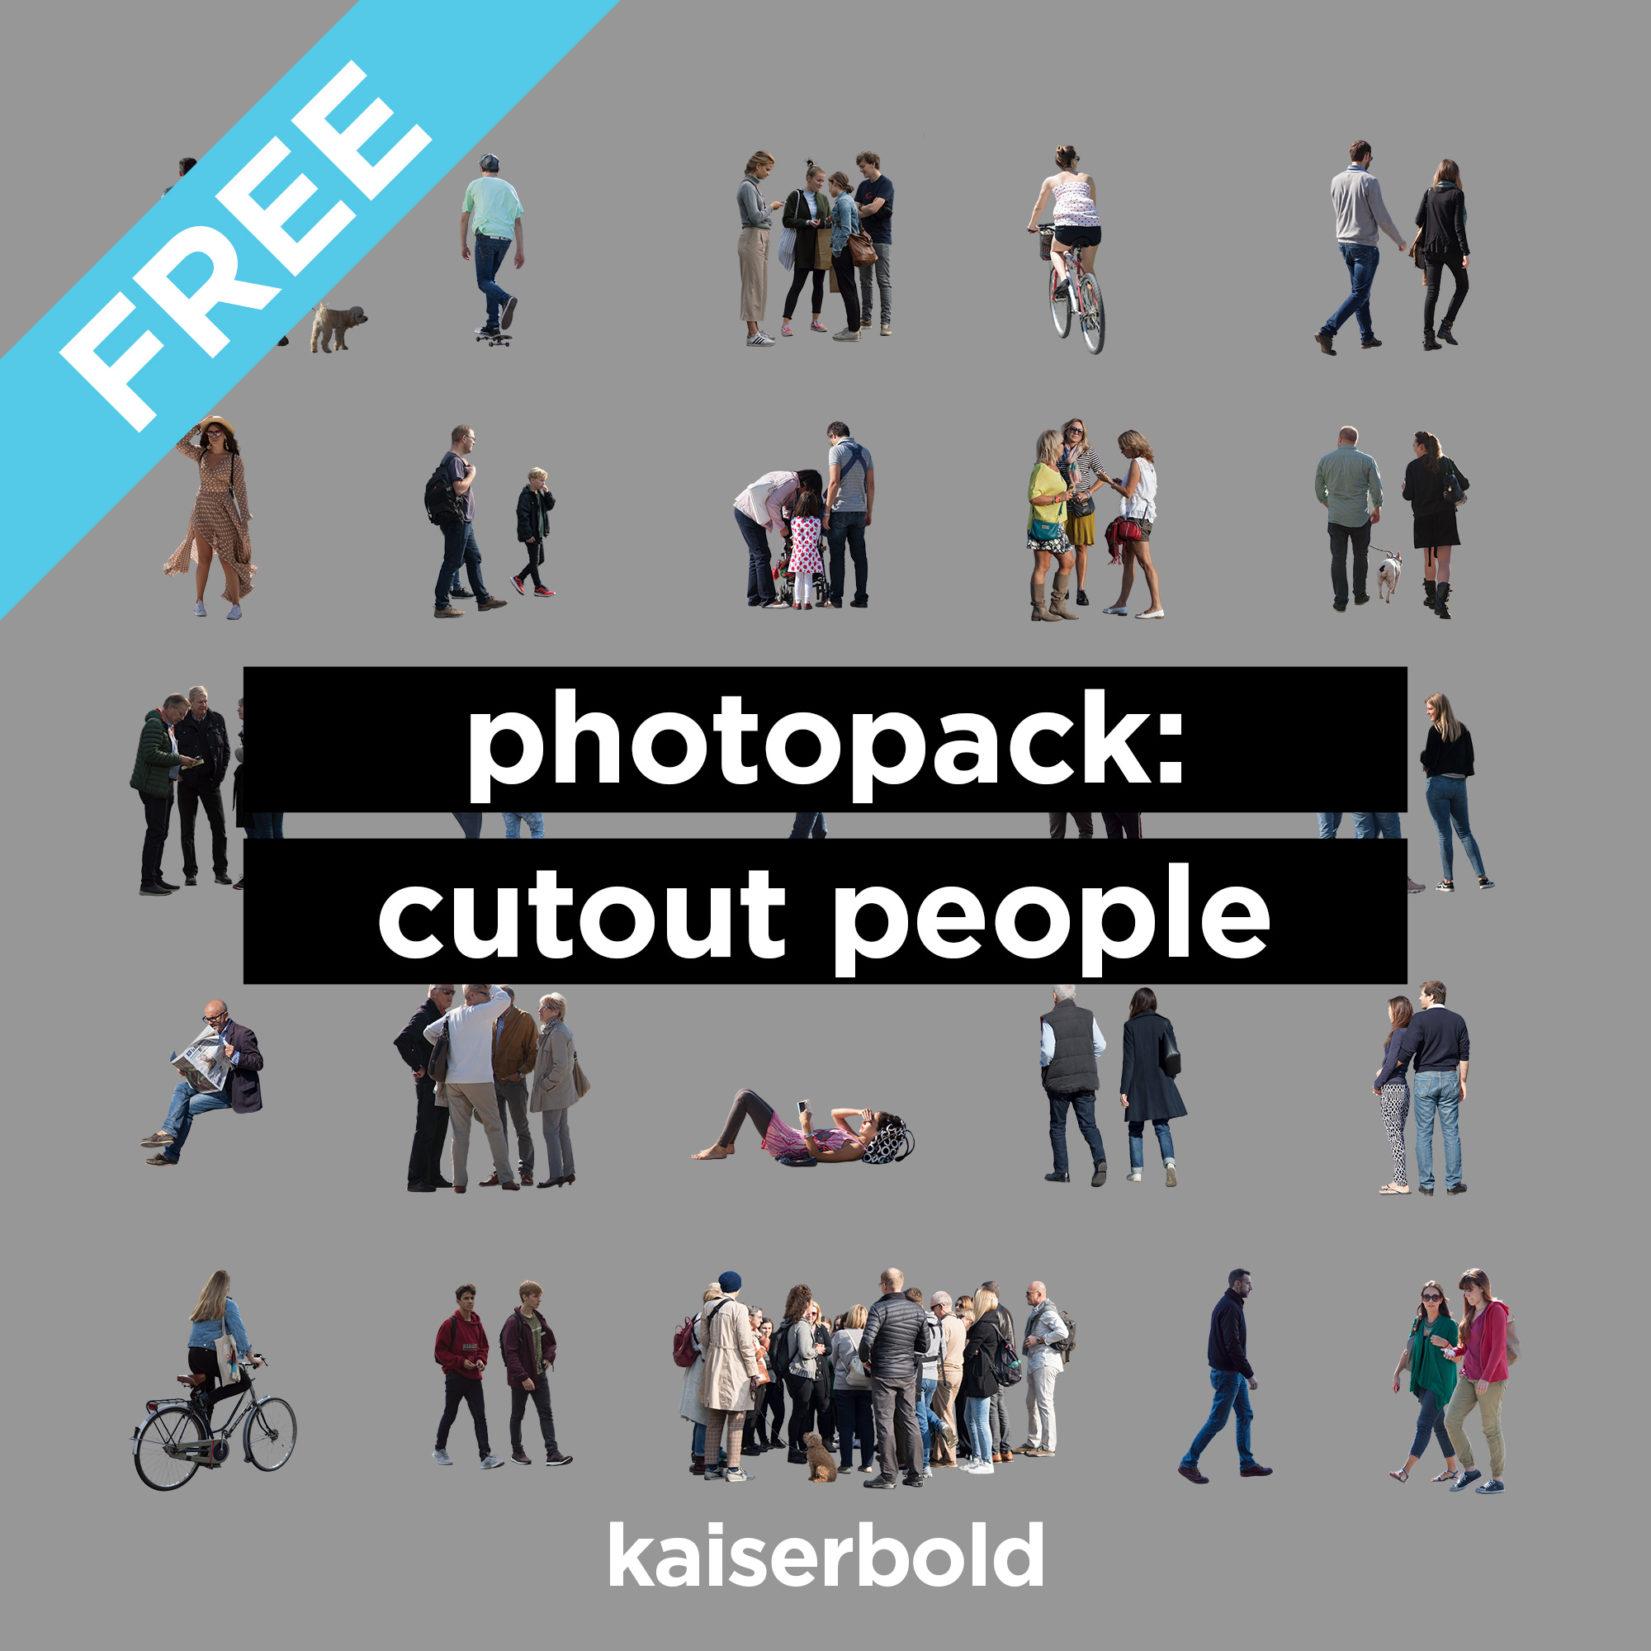 kaiserbold free cutout people 2019